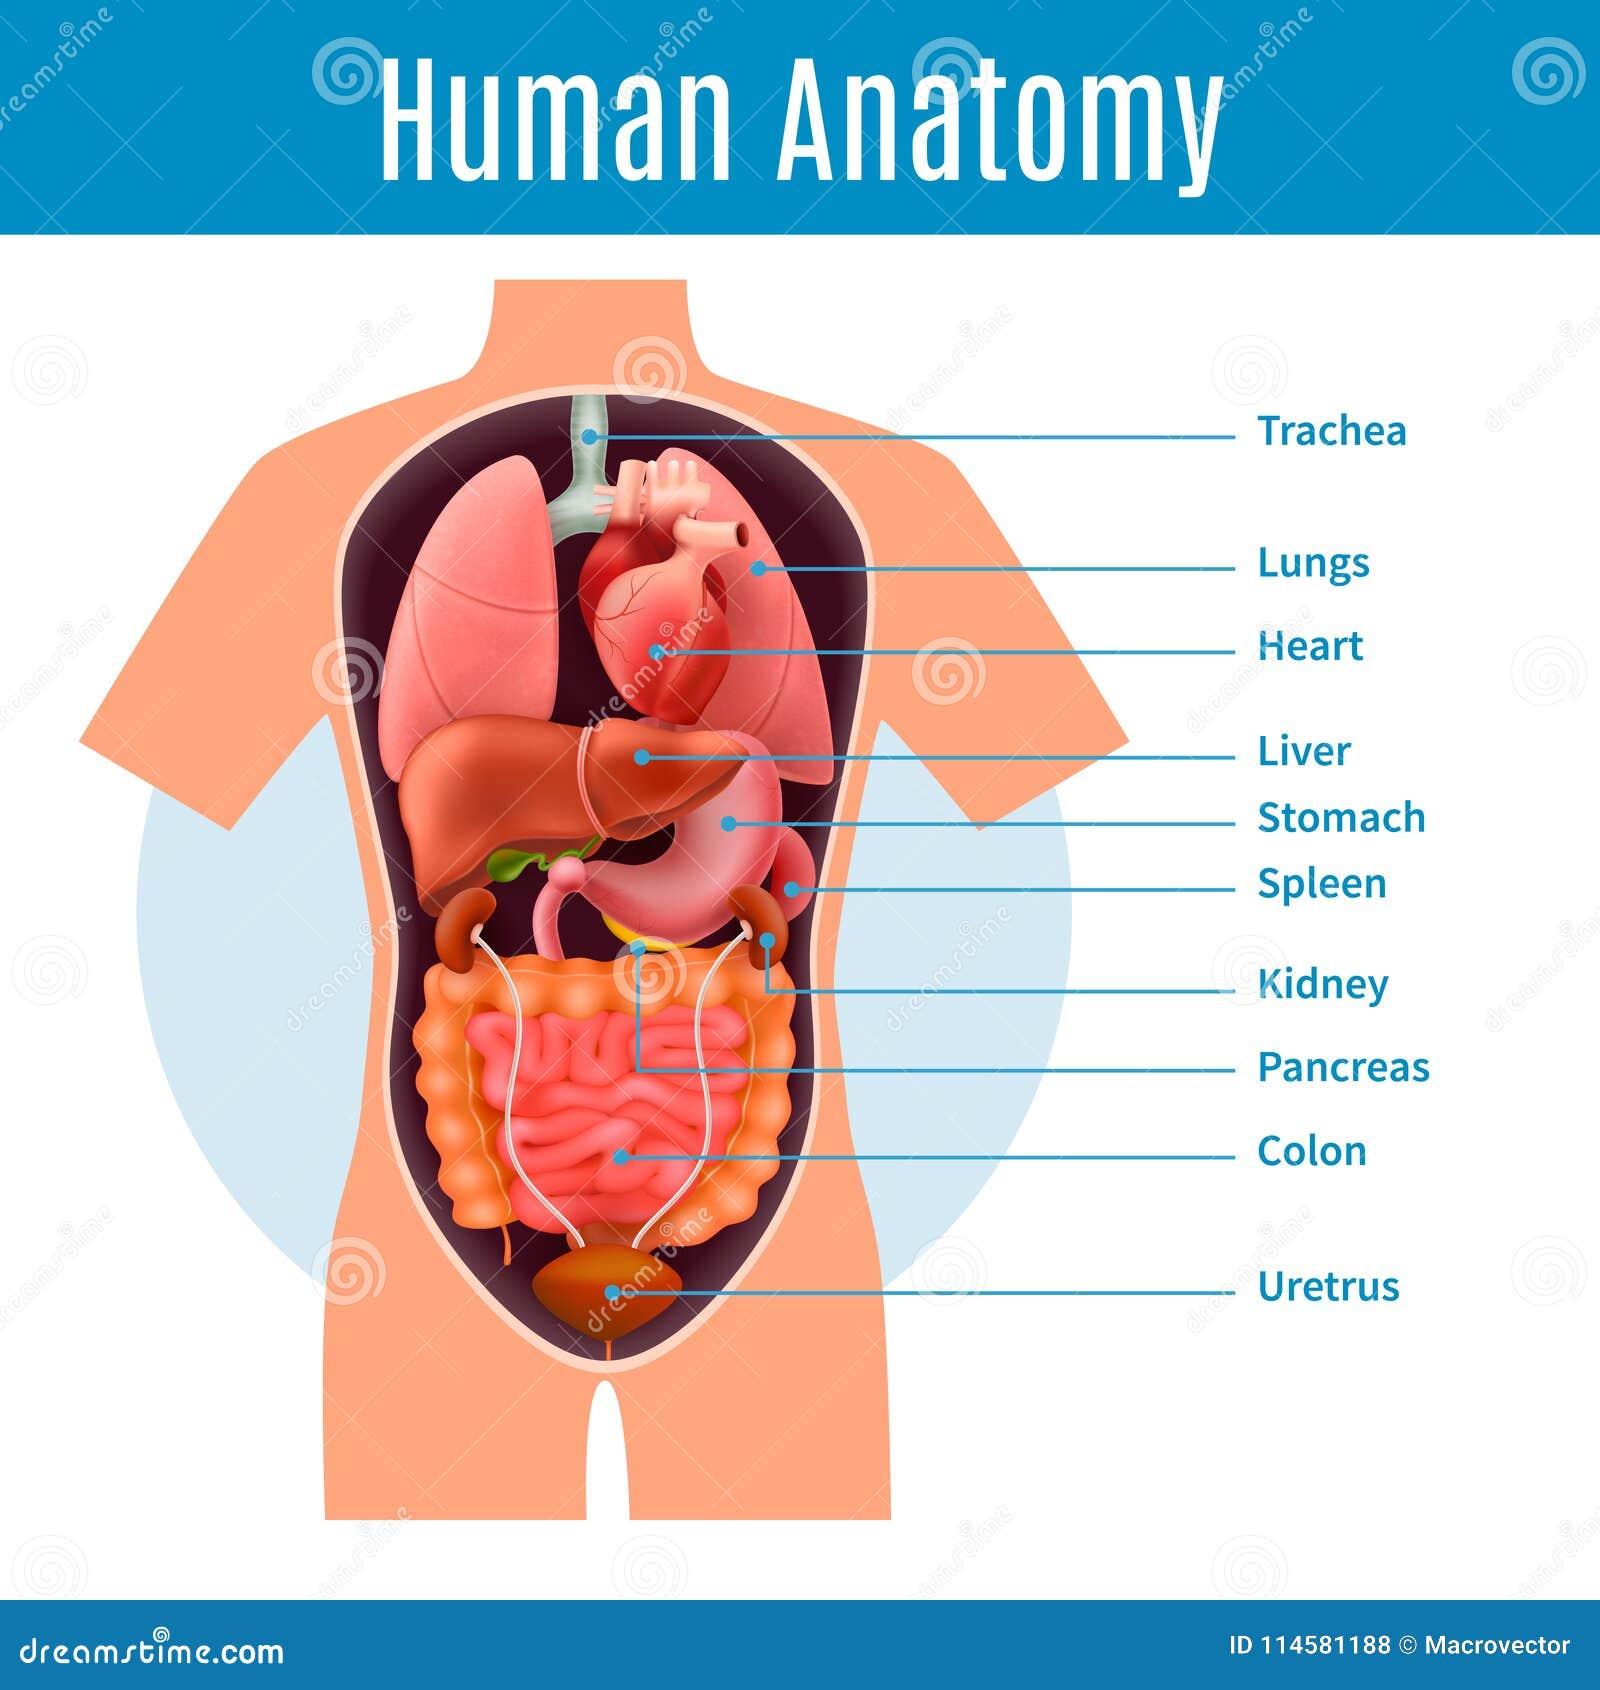 Human Anatomy Poster Stock Vector Illustration Of Anatomy 114581188